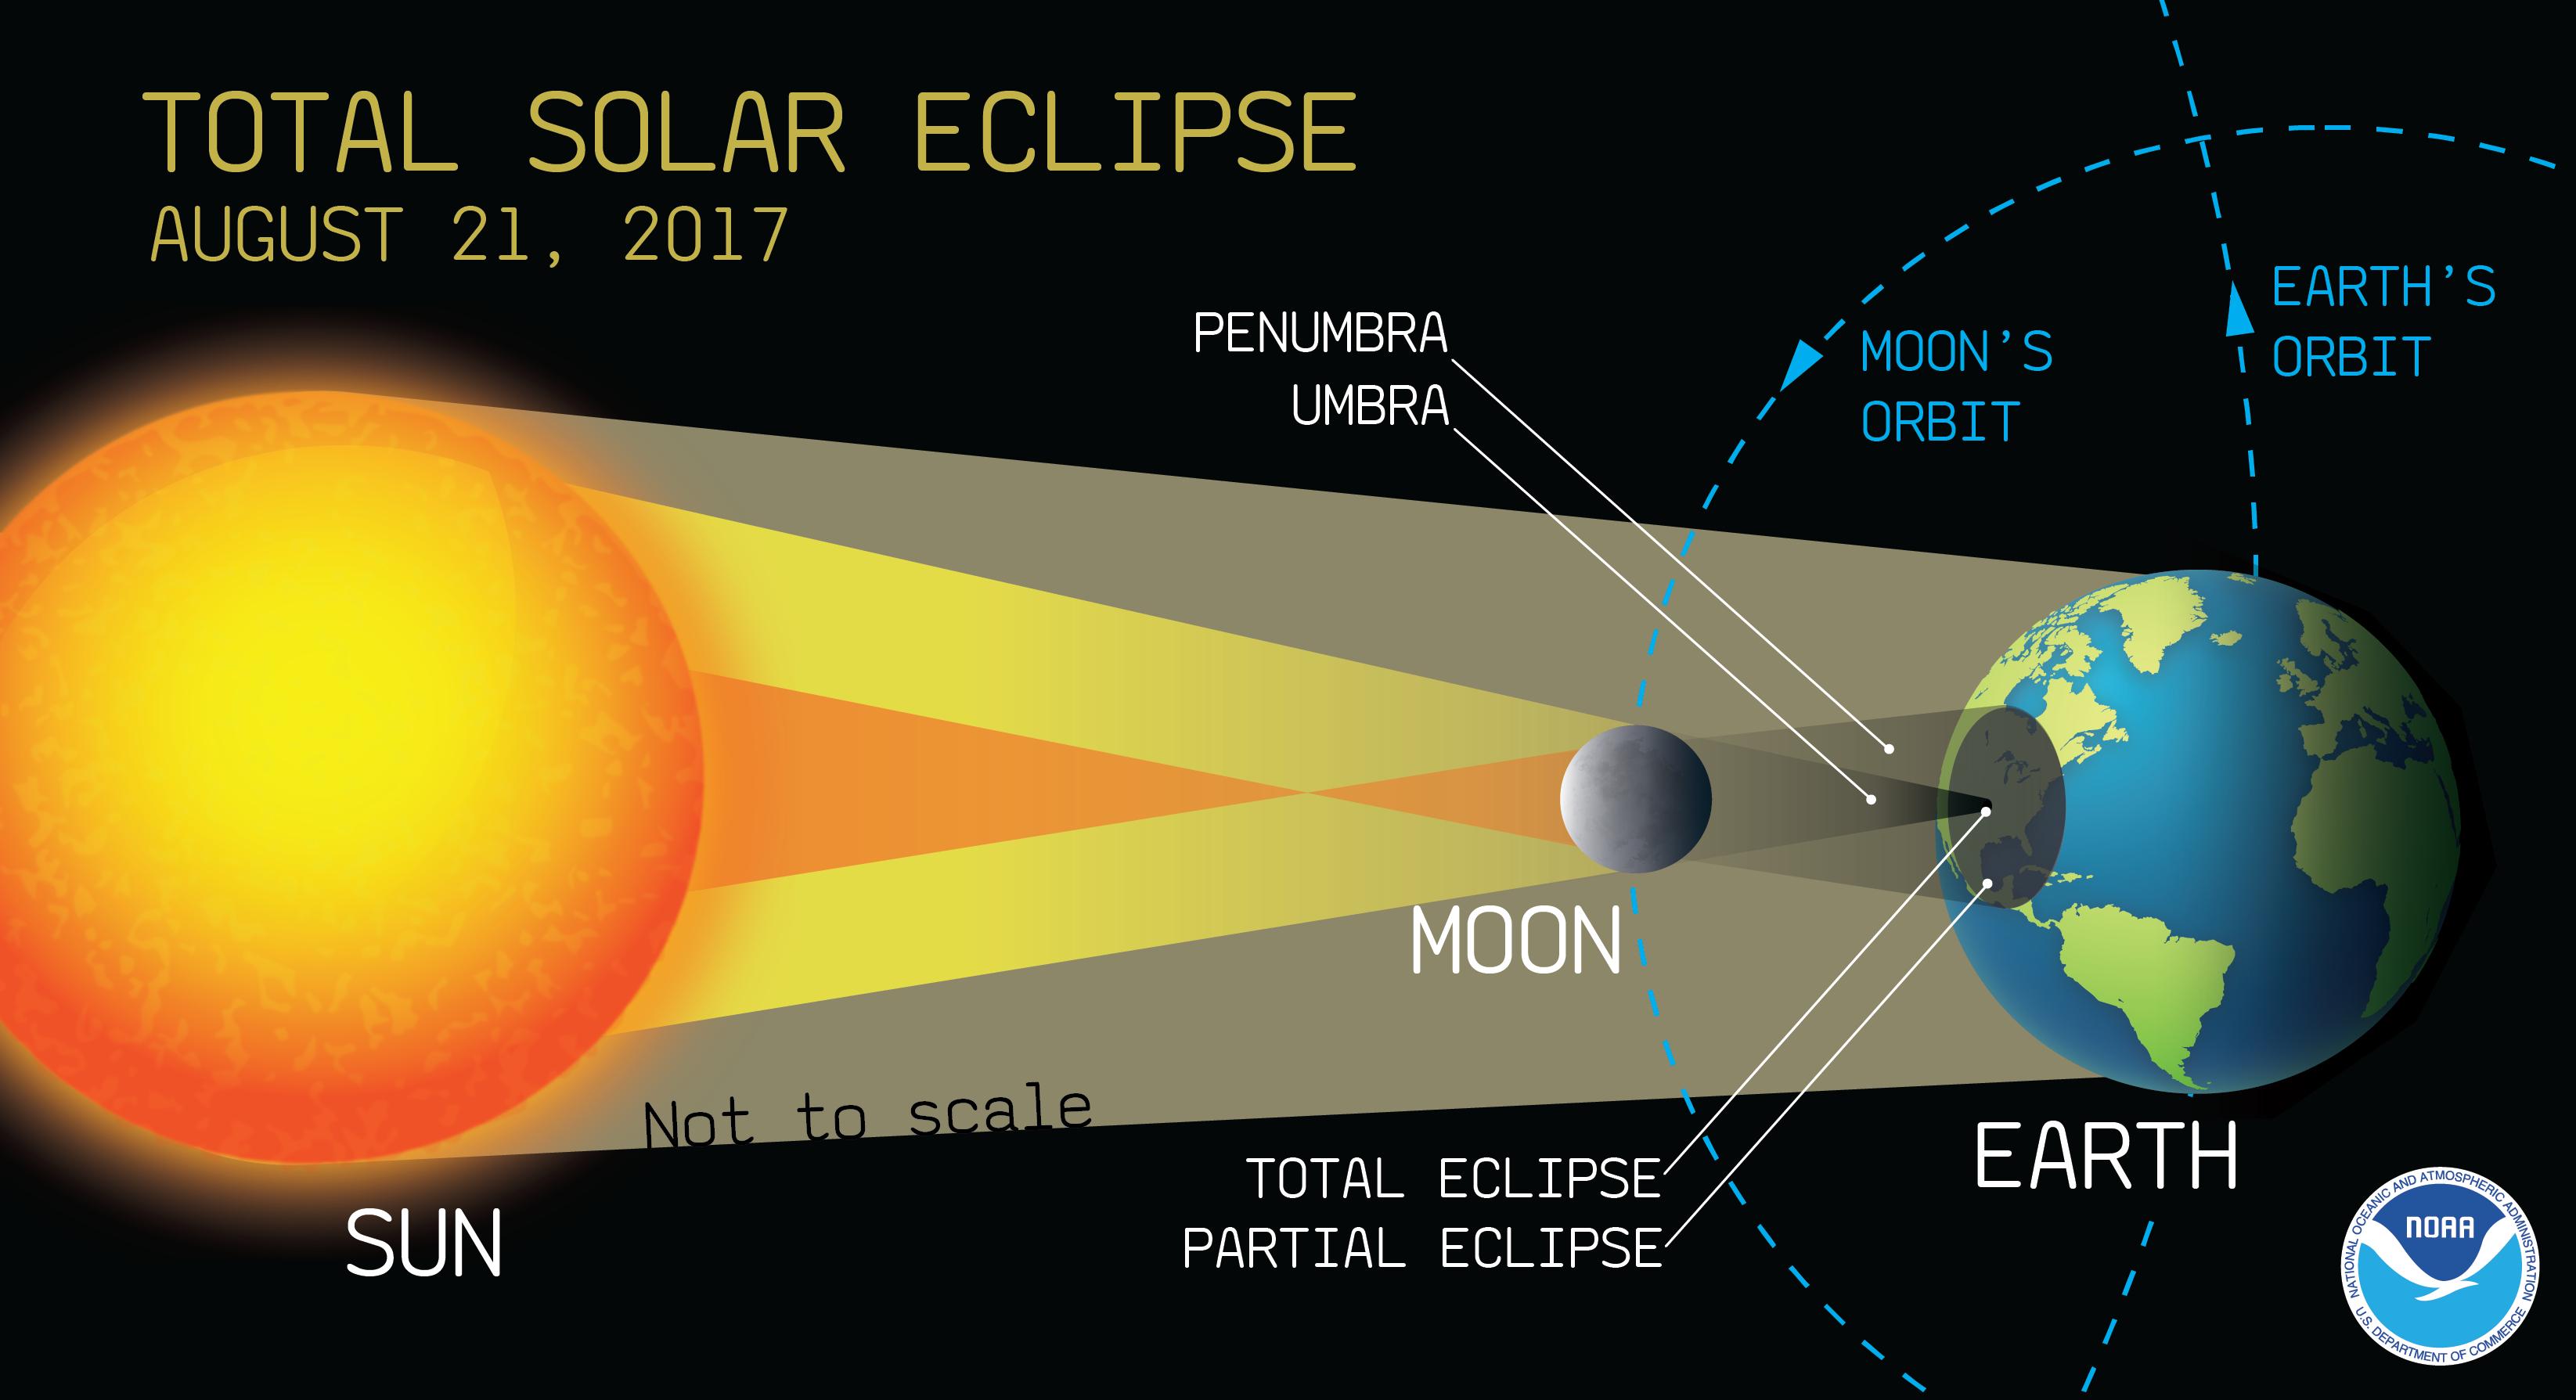 Solar Eclipse Diagram Danger Solar Eclipse Glasses And Proper Viewing Please Read